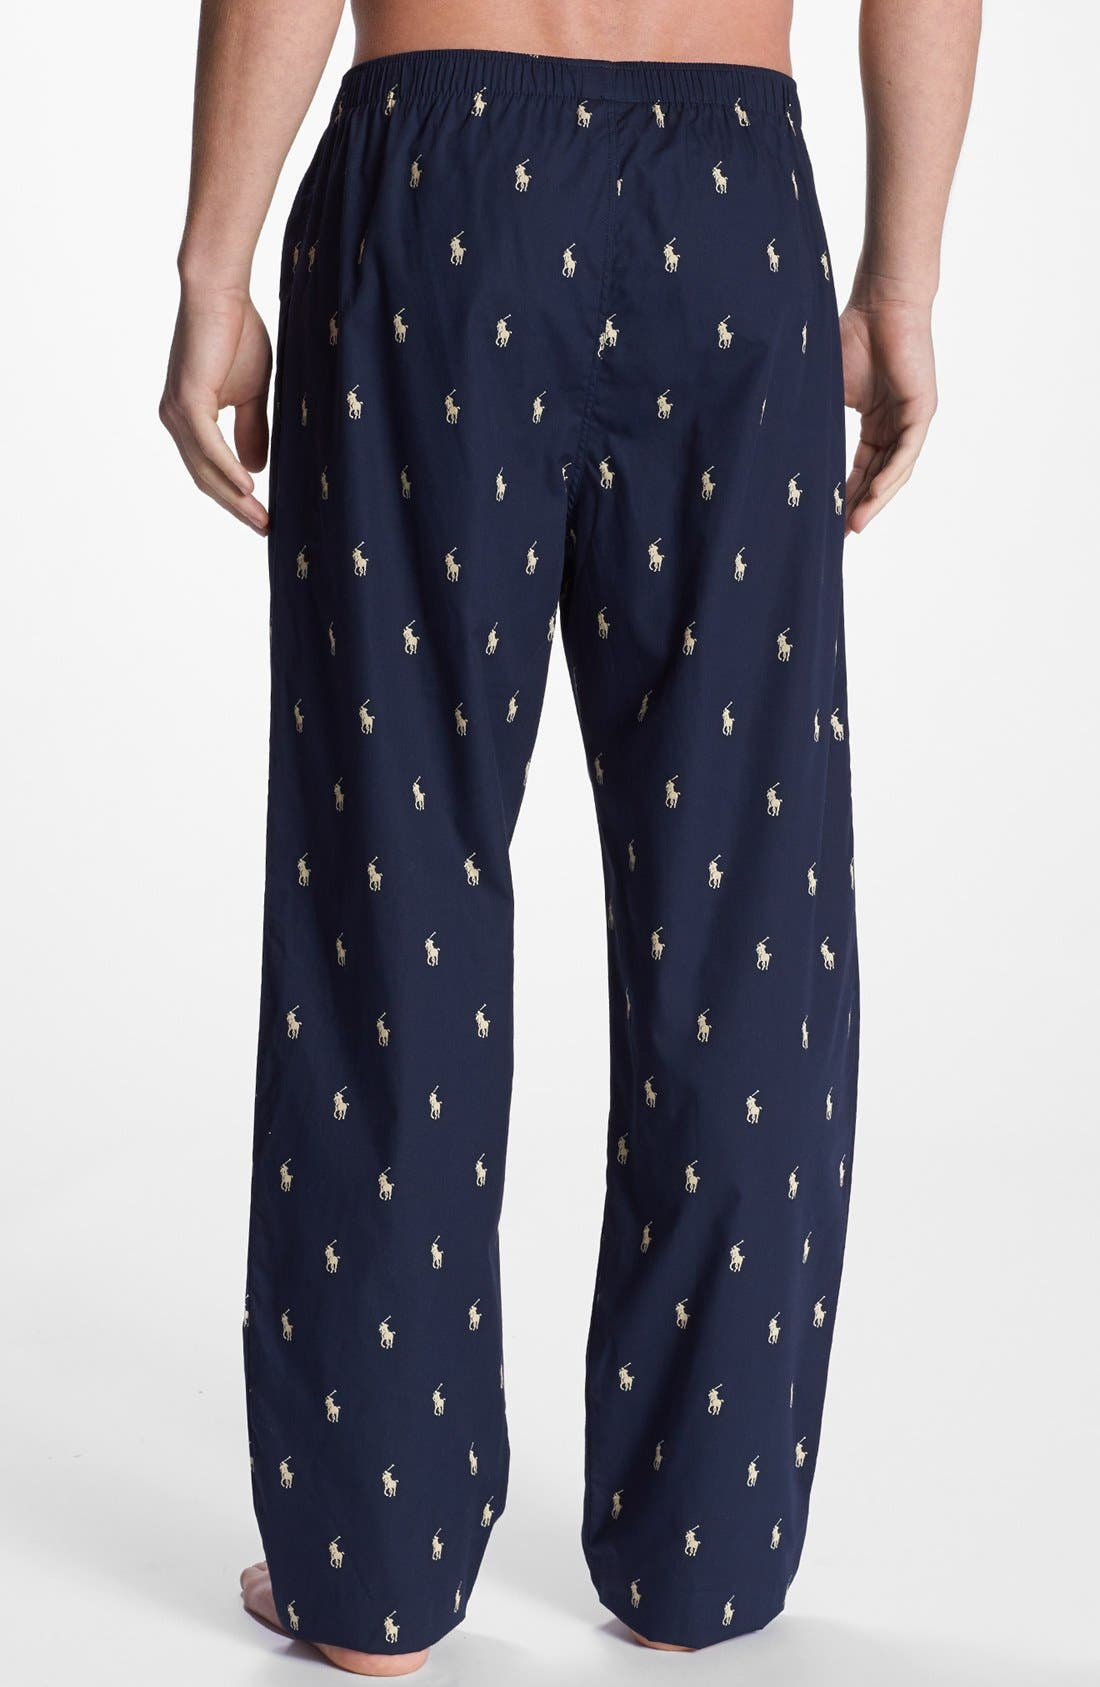 Cotton Lounge Pants,                             Alternate thumbnail 2, color,                             Navy/ White